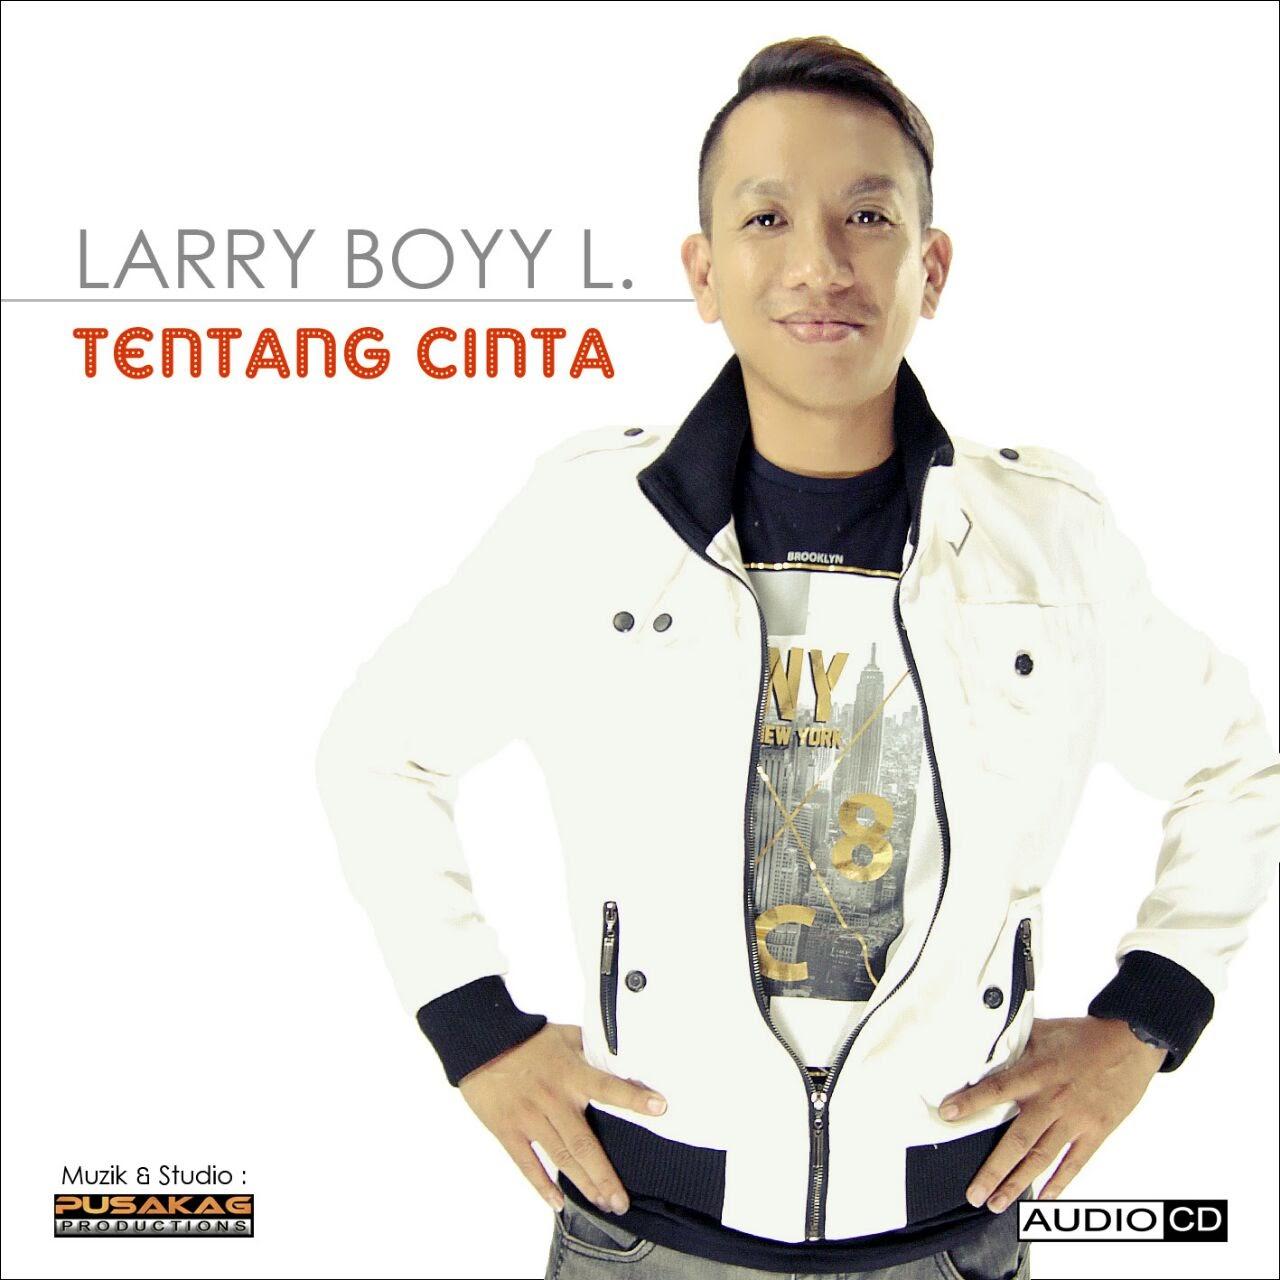 Artis Larry Boyy L.